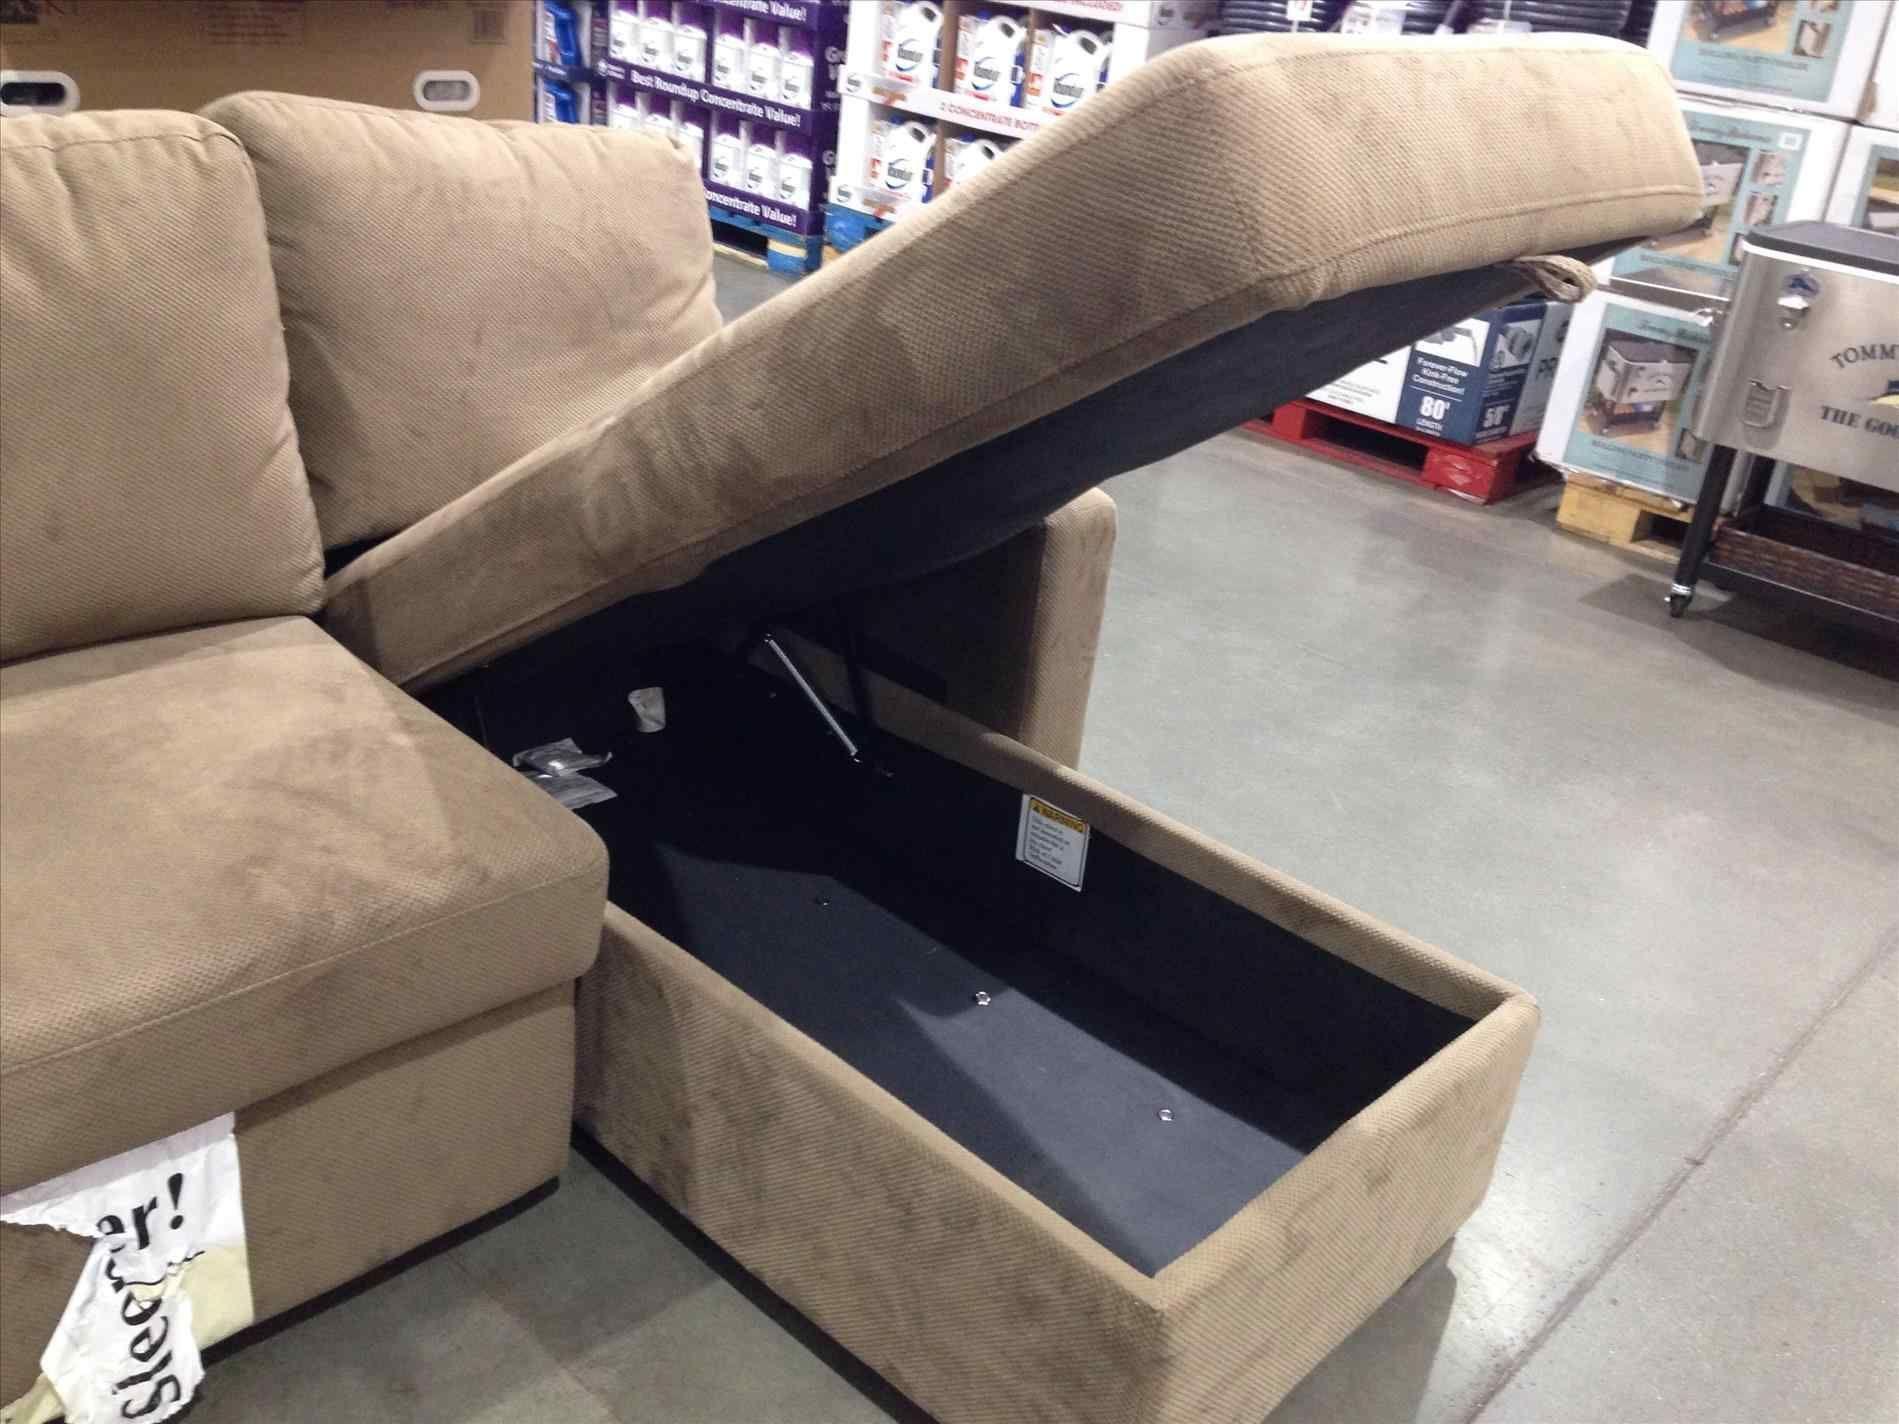 costco sectional sofa 2014 model chaise newton s chaise costco